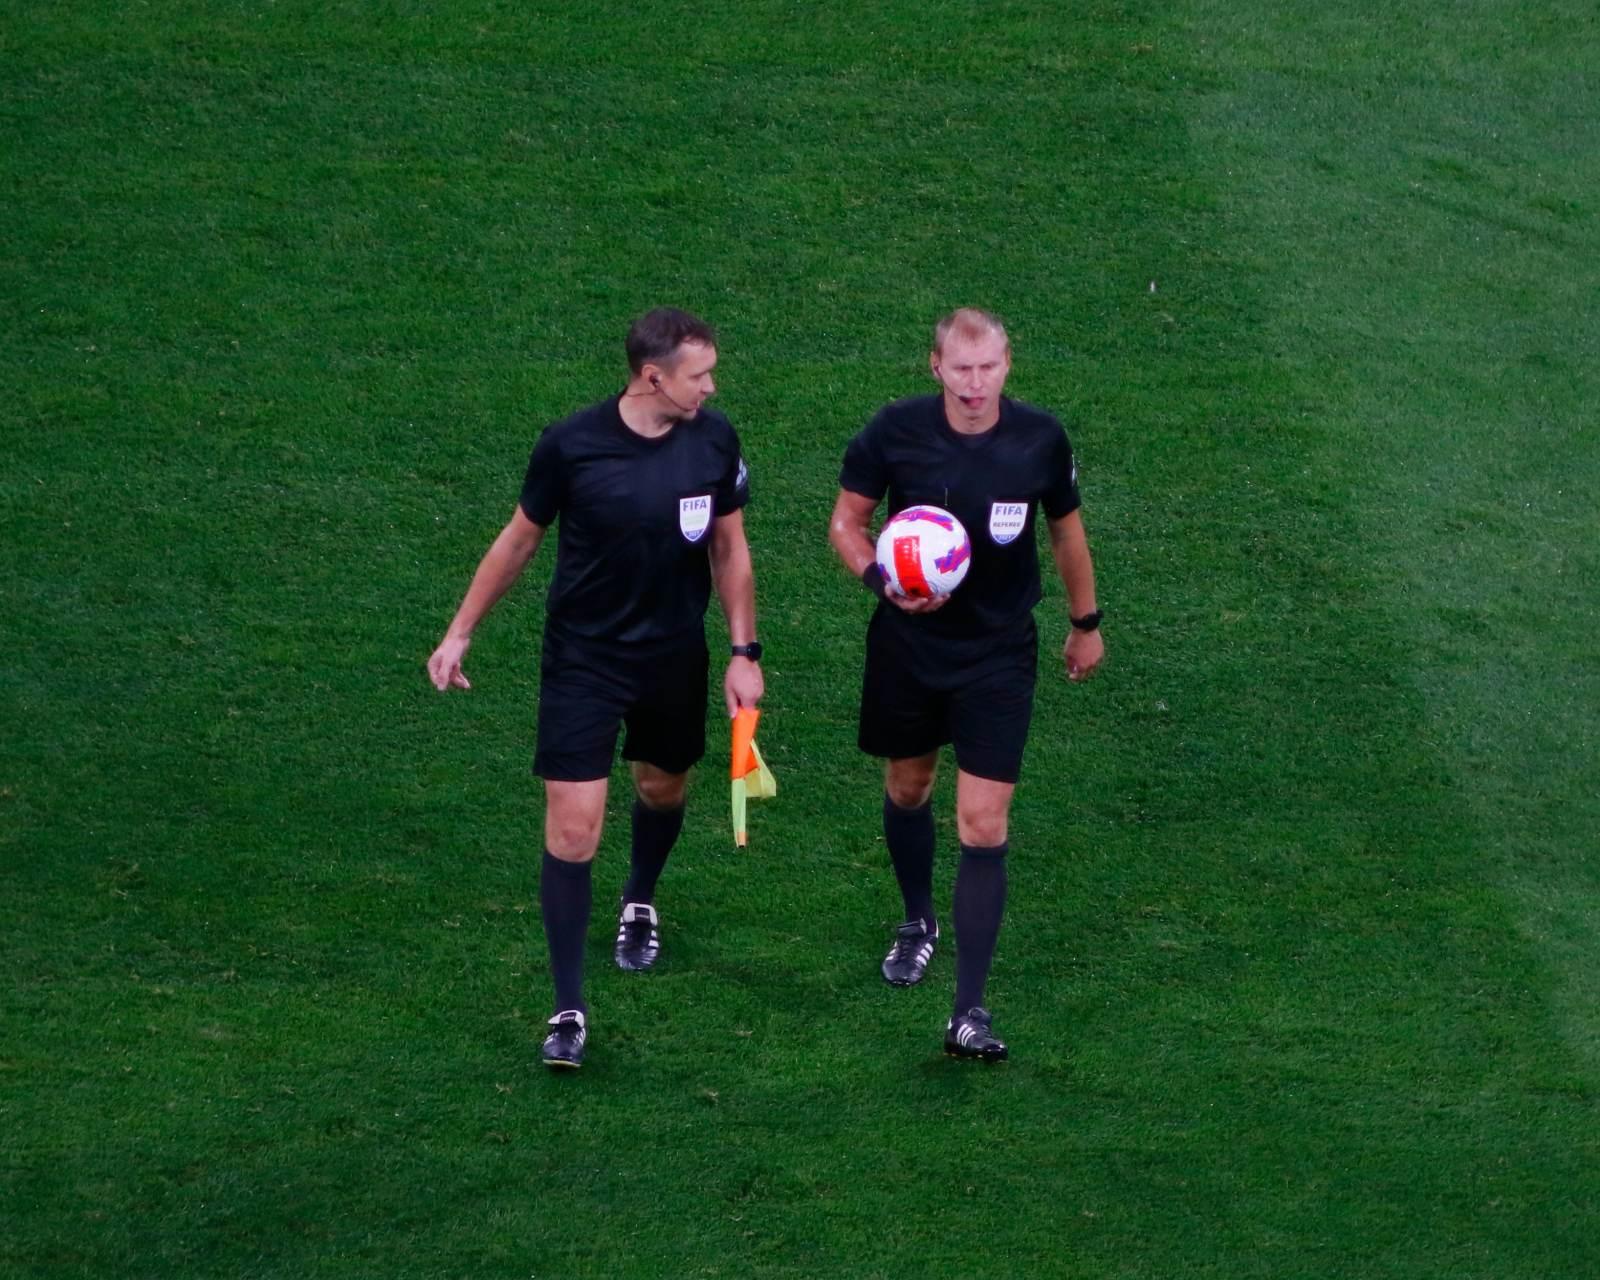 Российские судьи отработают на матче «Реал Сосьедад» - «Монако»